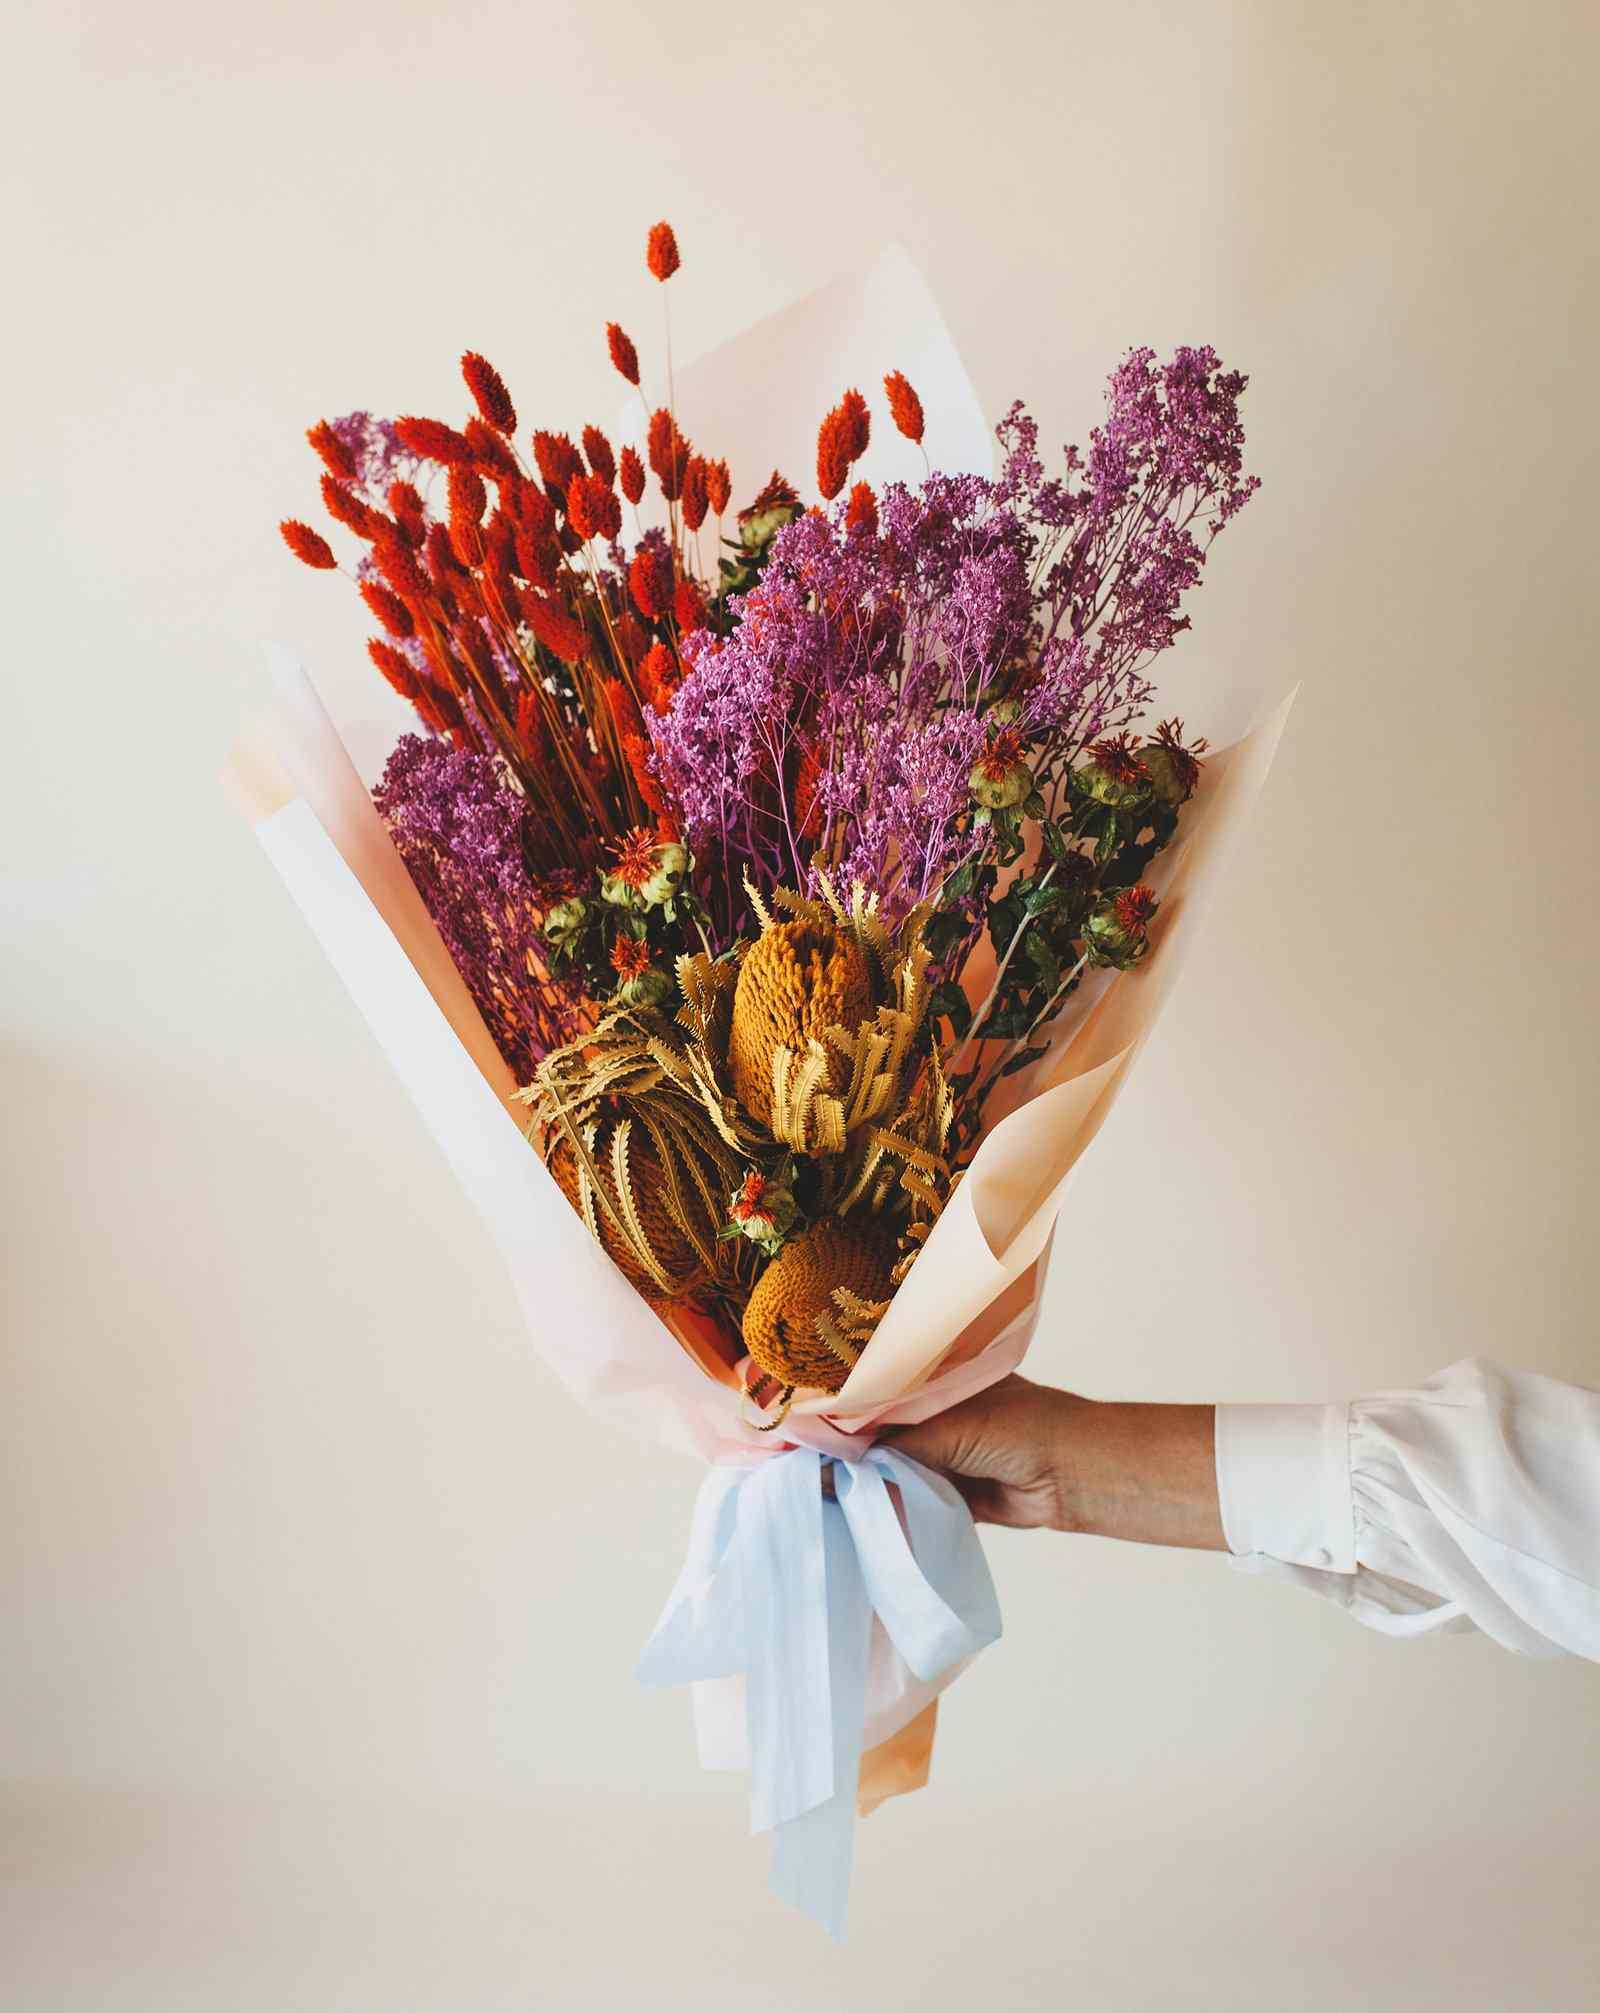 Idlewild Floral Co. Summer Bouquet